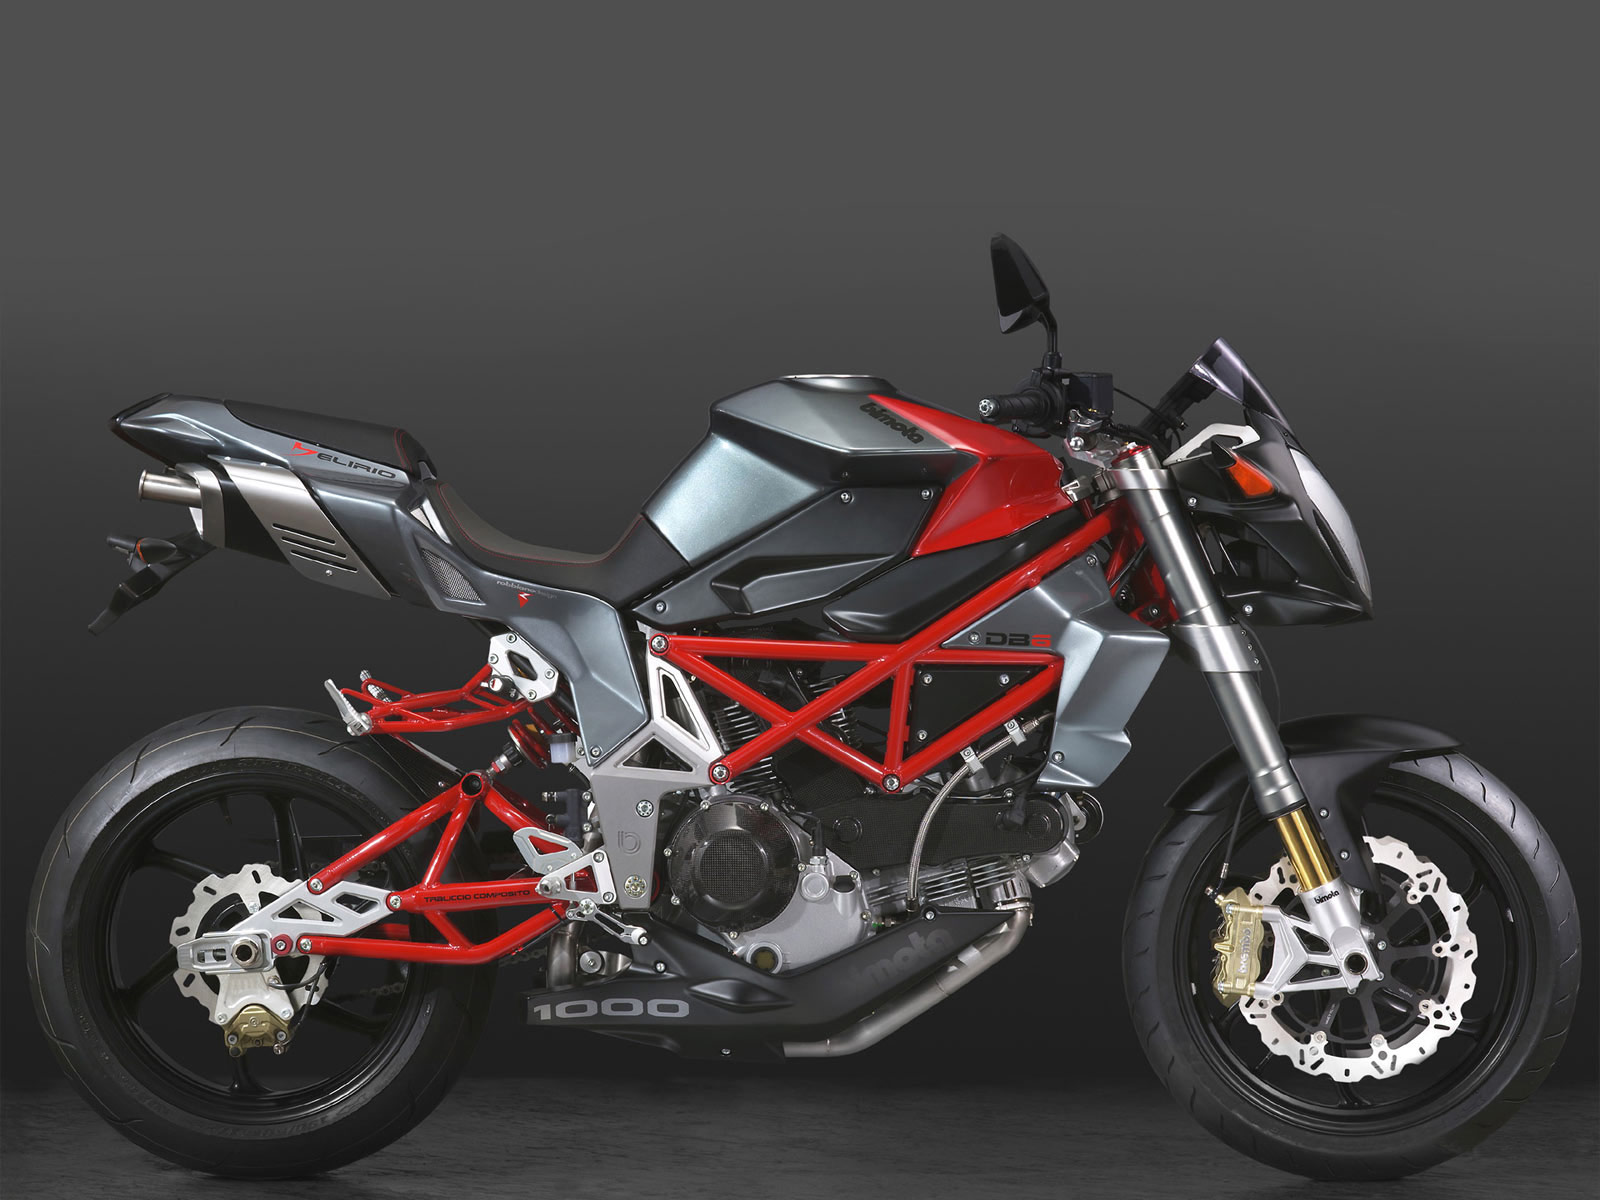 http://1.bp.blogspot.com/-hlCR8oTkyUE/Tr5DZ_fMRlI/AAAAAAAAEHg/p3IDvmQN7qs/s1600/Bimota-DB6-Delirio_motorcycle-desktop-wallpaper_03.jpg